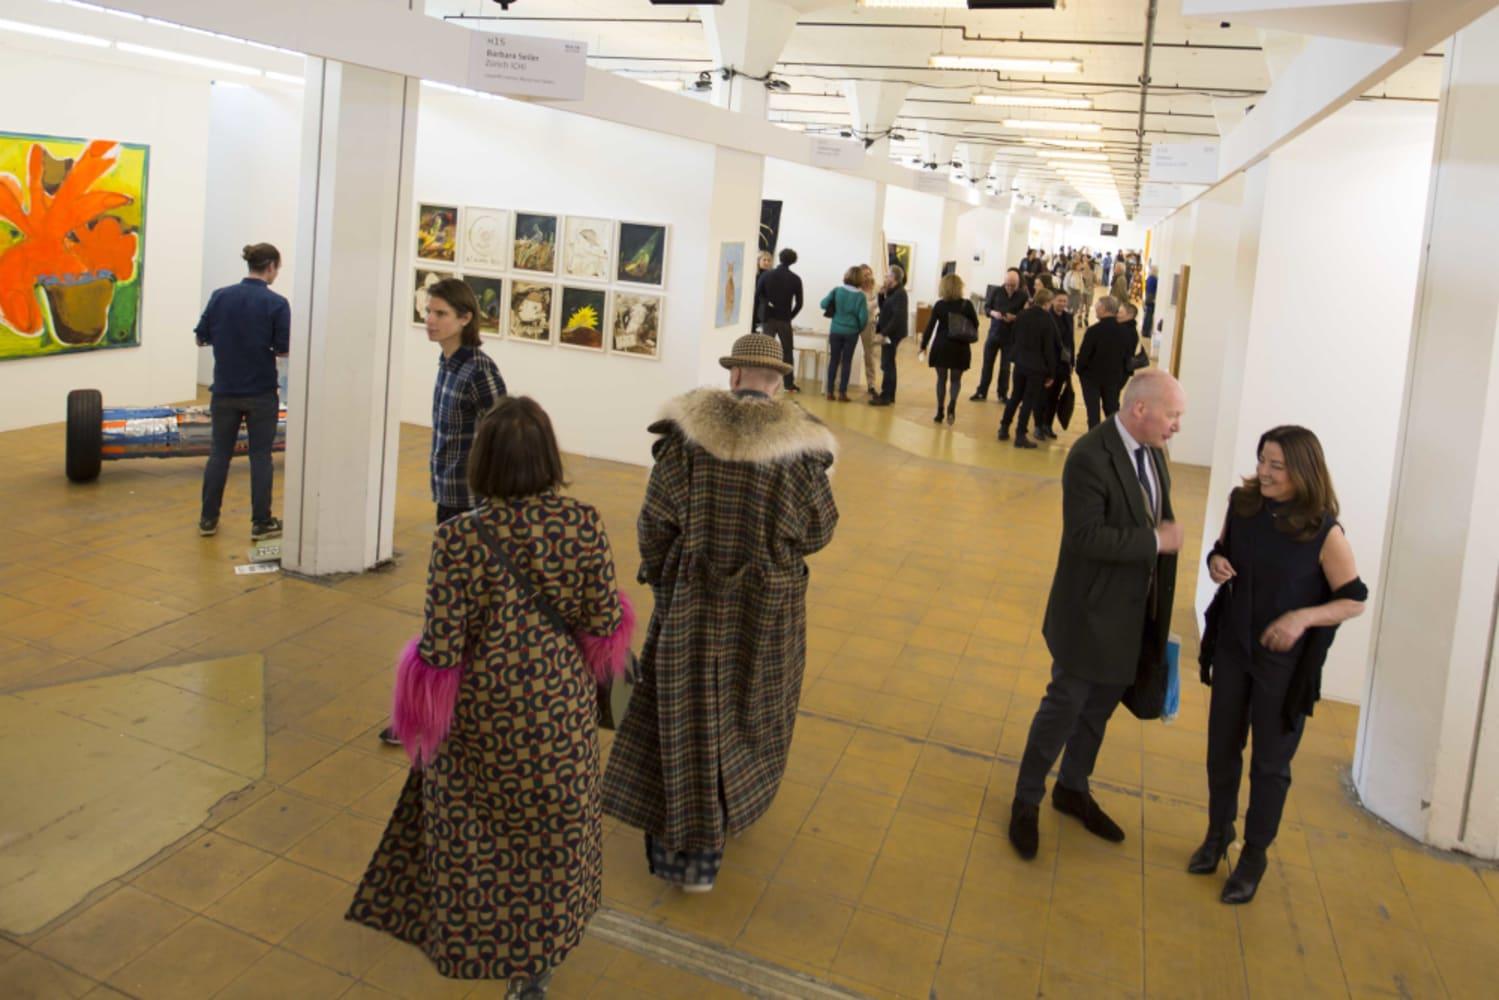 Catalogue Art Rotterdam on Gallery Viewer